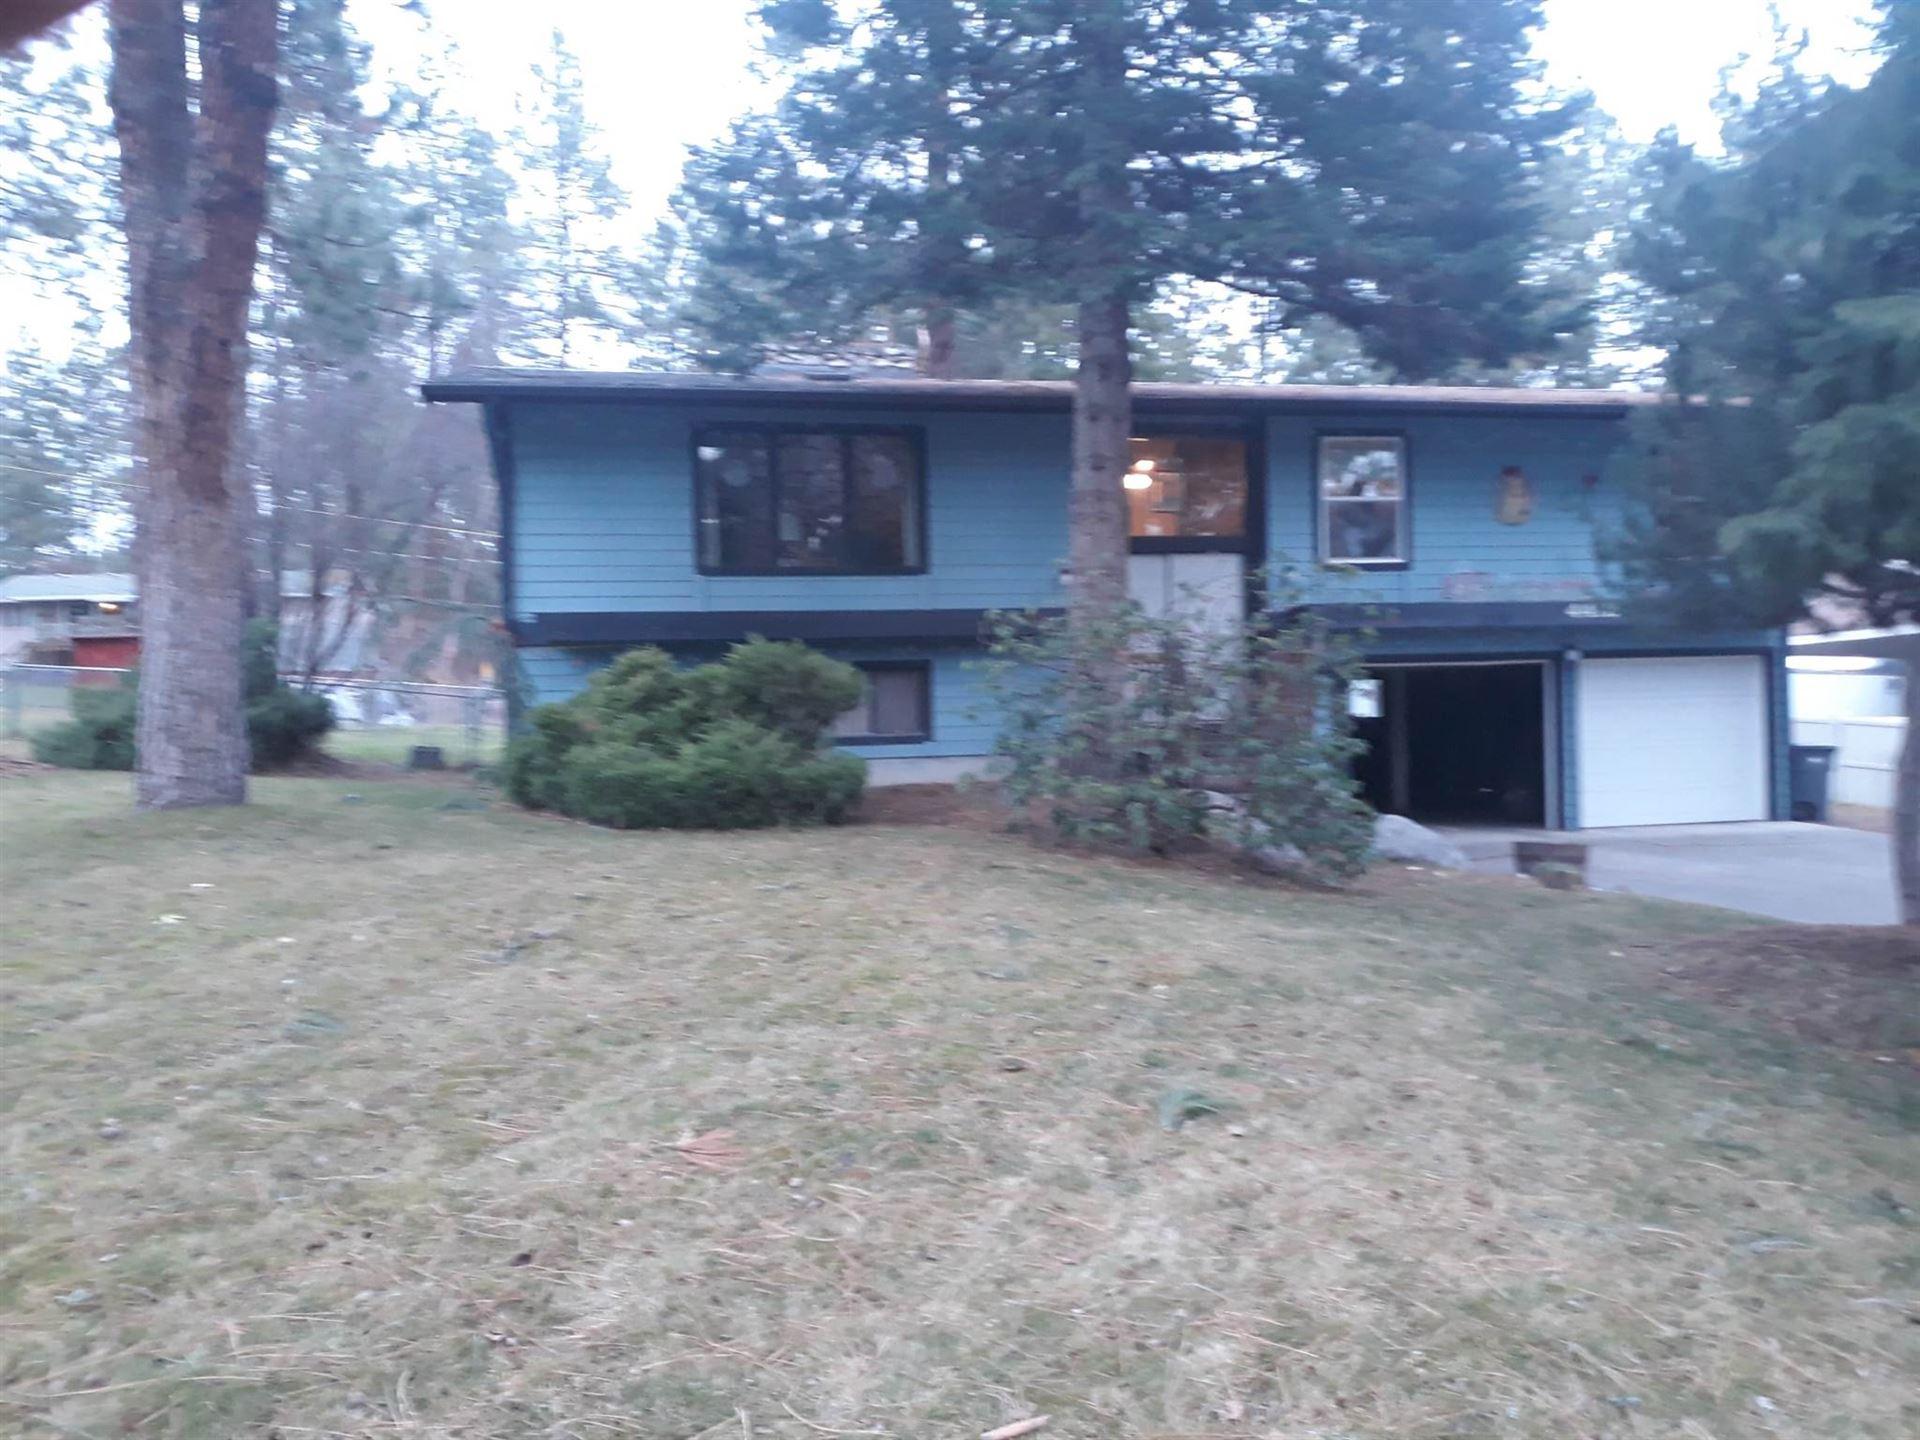 4412 N Ely Rd, Spokane, WA 99212-1709 - #: 202110517